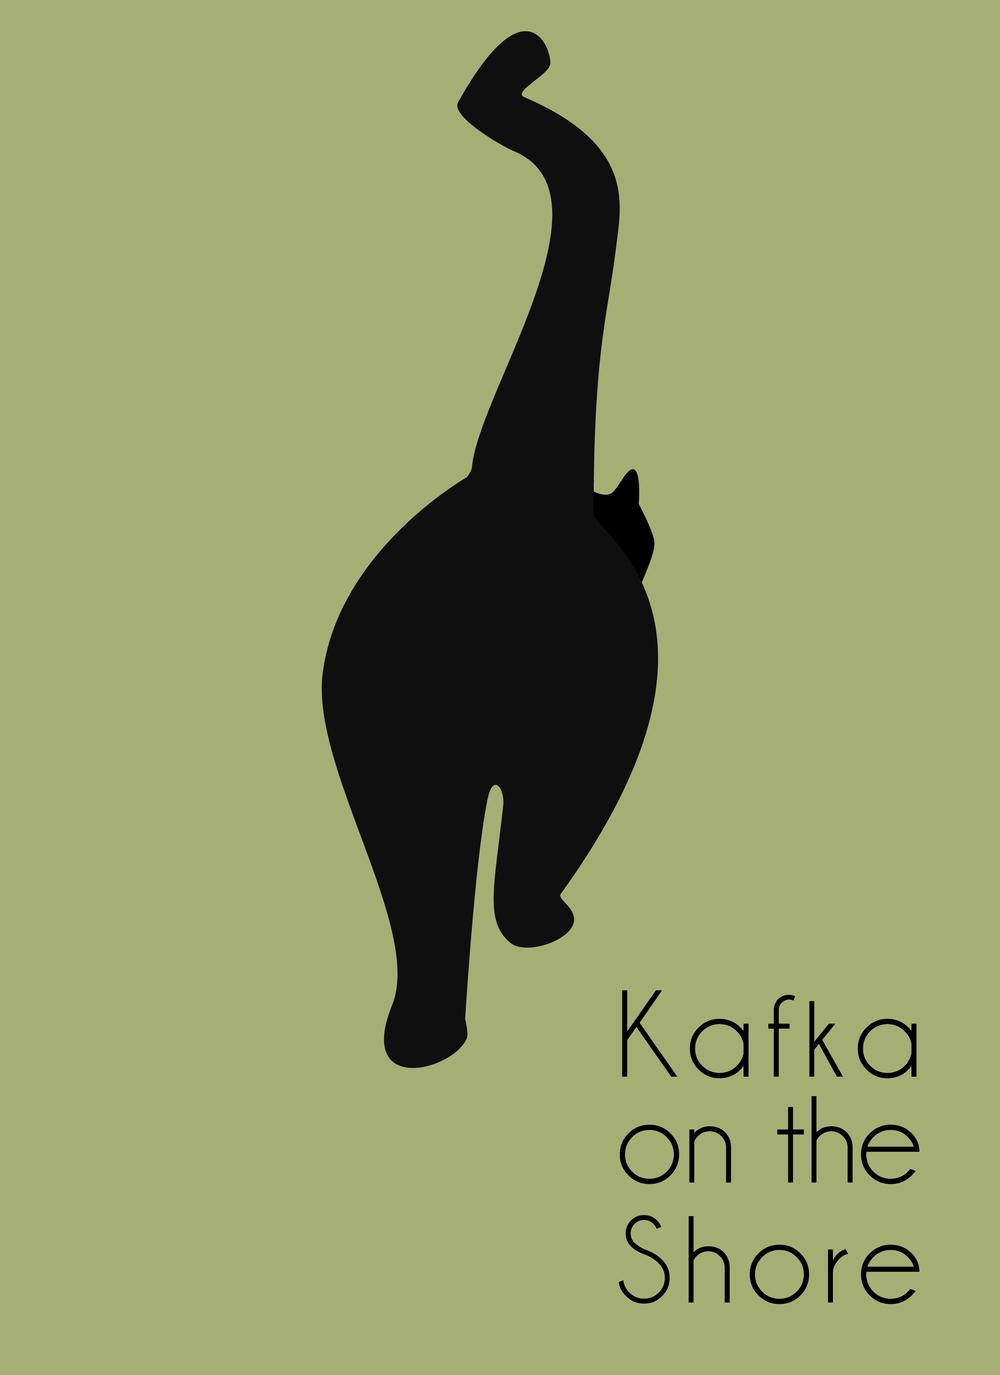 Kafka_on_shore.png